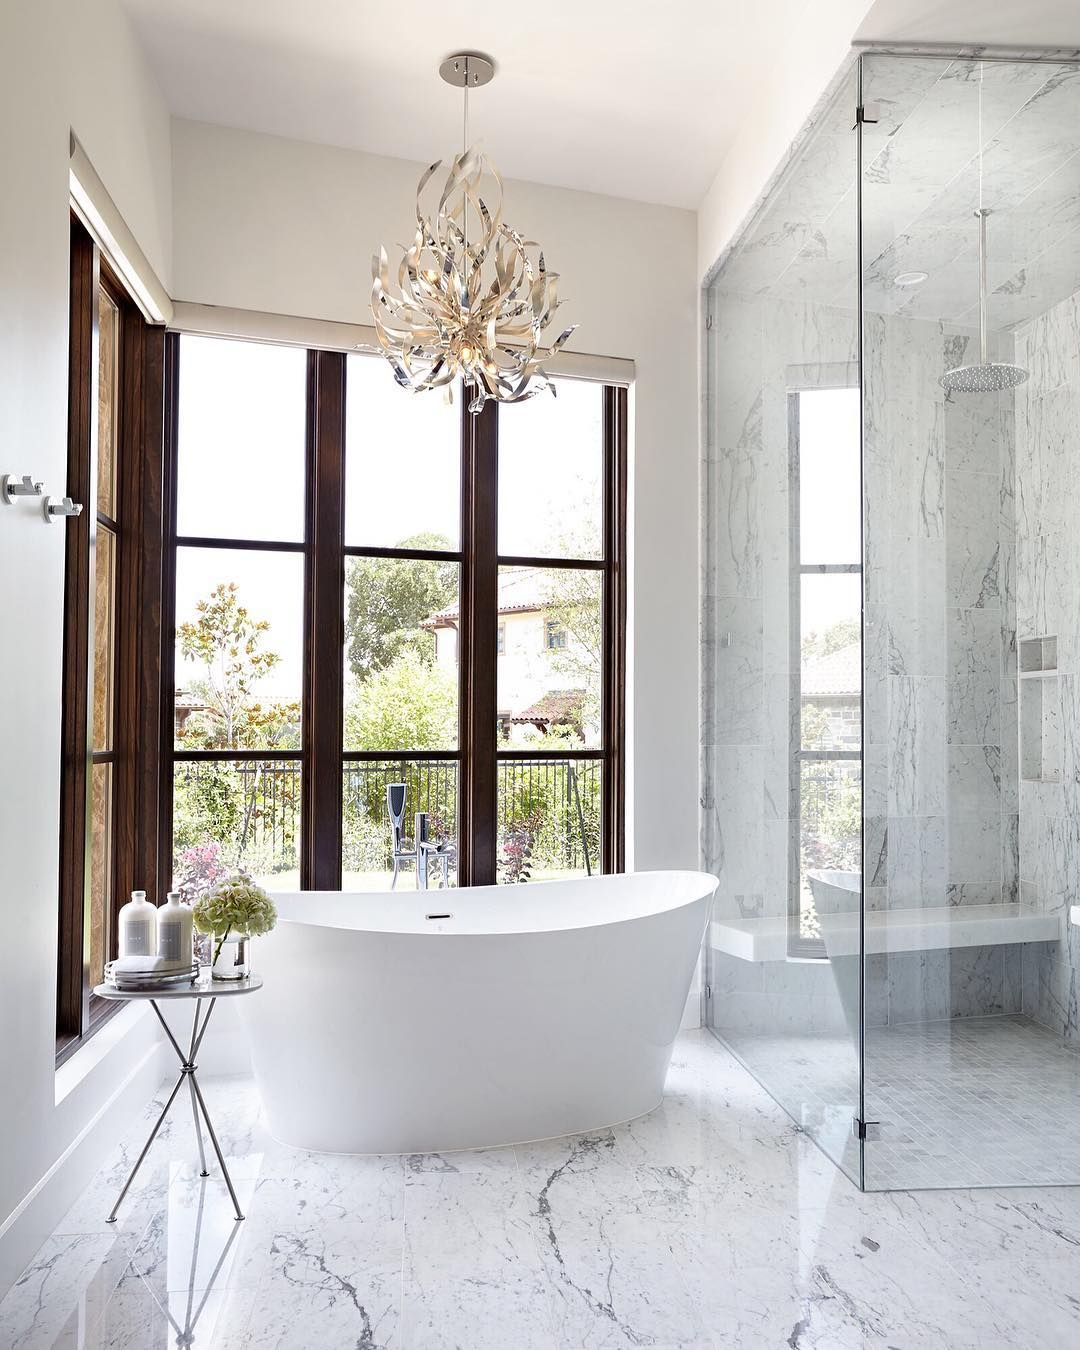 Simply Exquisite Corbett Graffiti Chandelier Brandlighting Bathroom Lighting Inspiration Marble Detail Bathroom Design